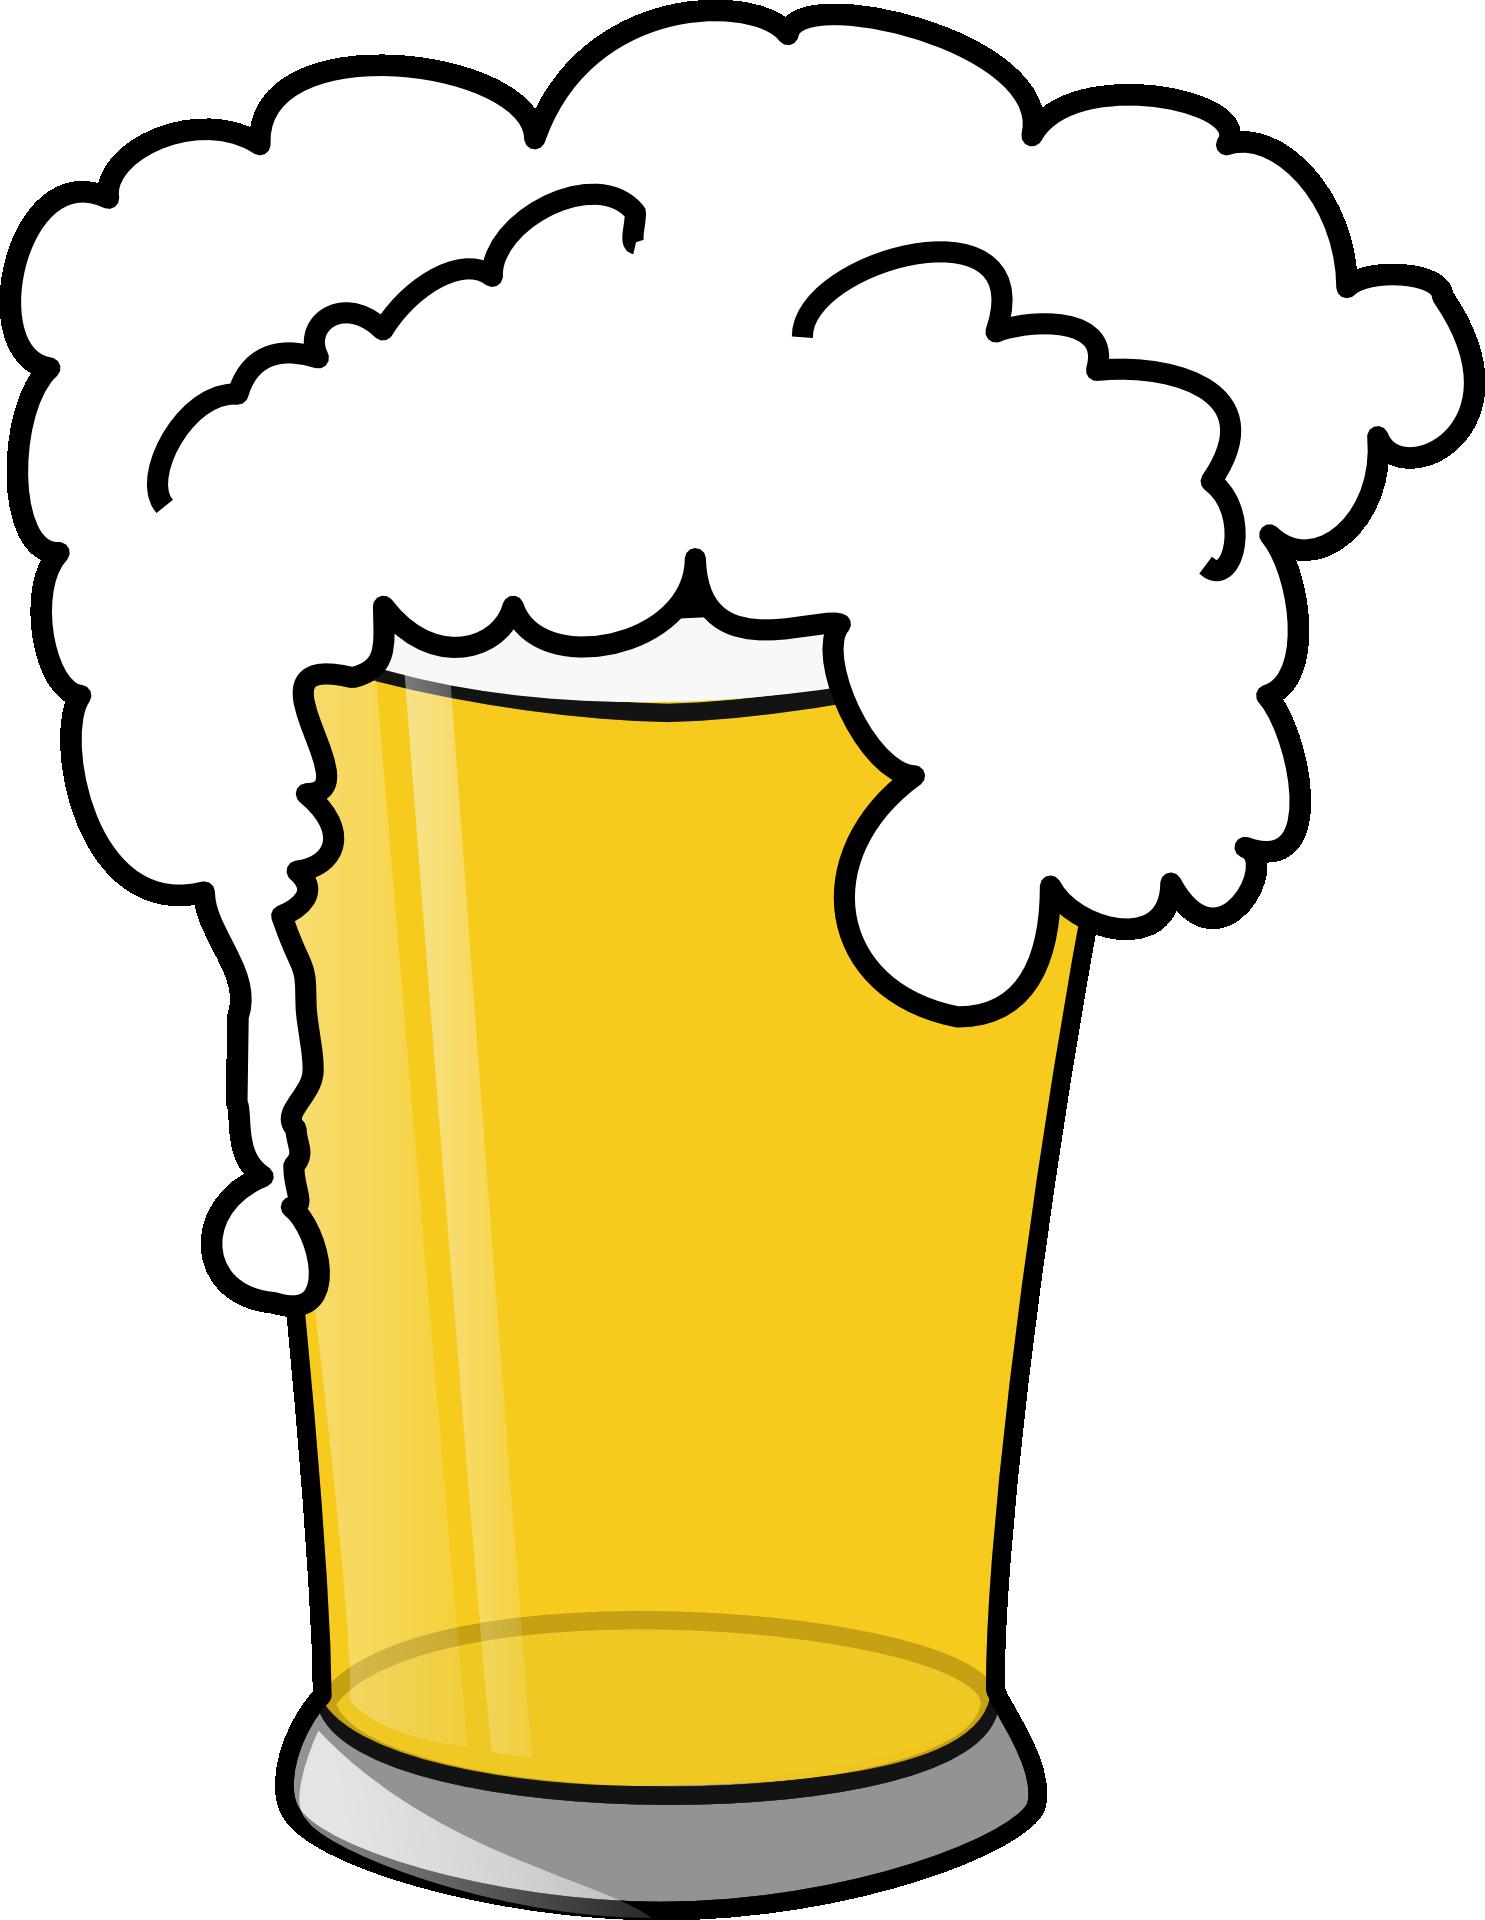 Beer alcoholic beverage